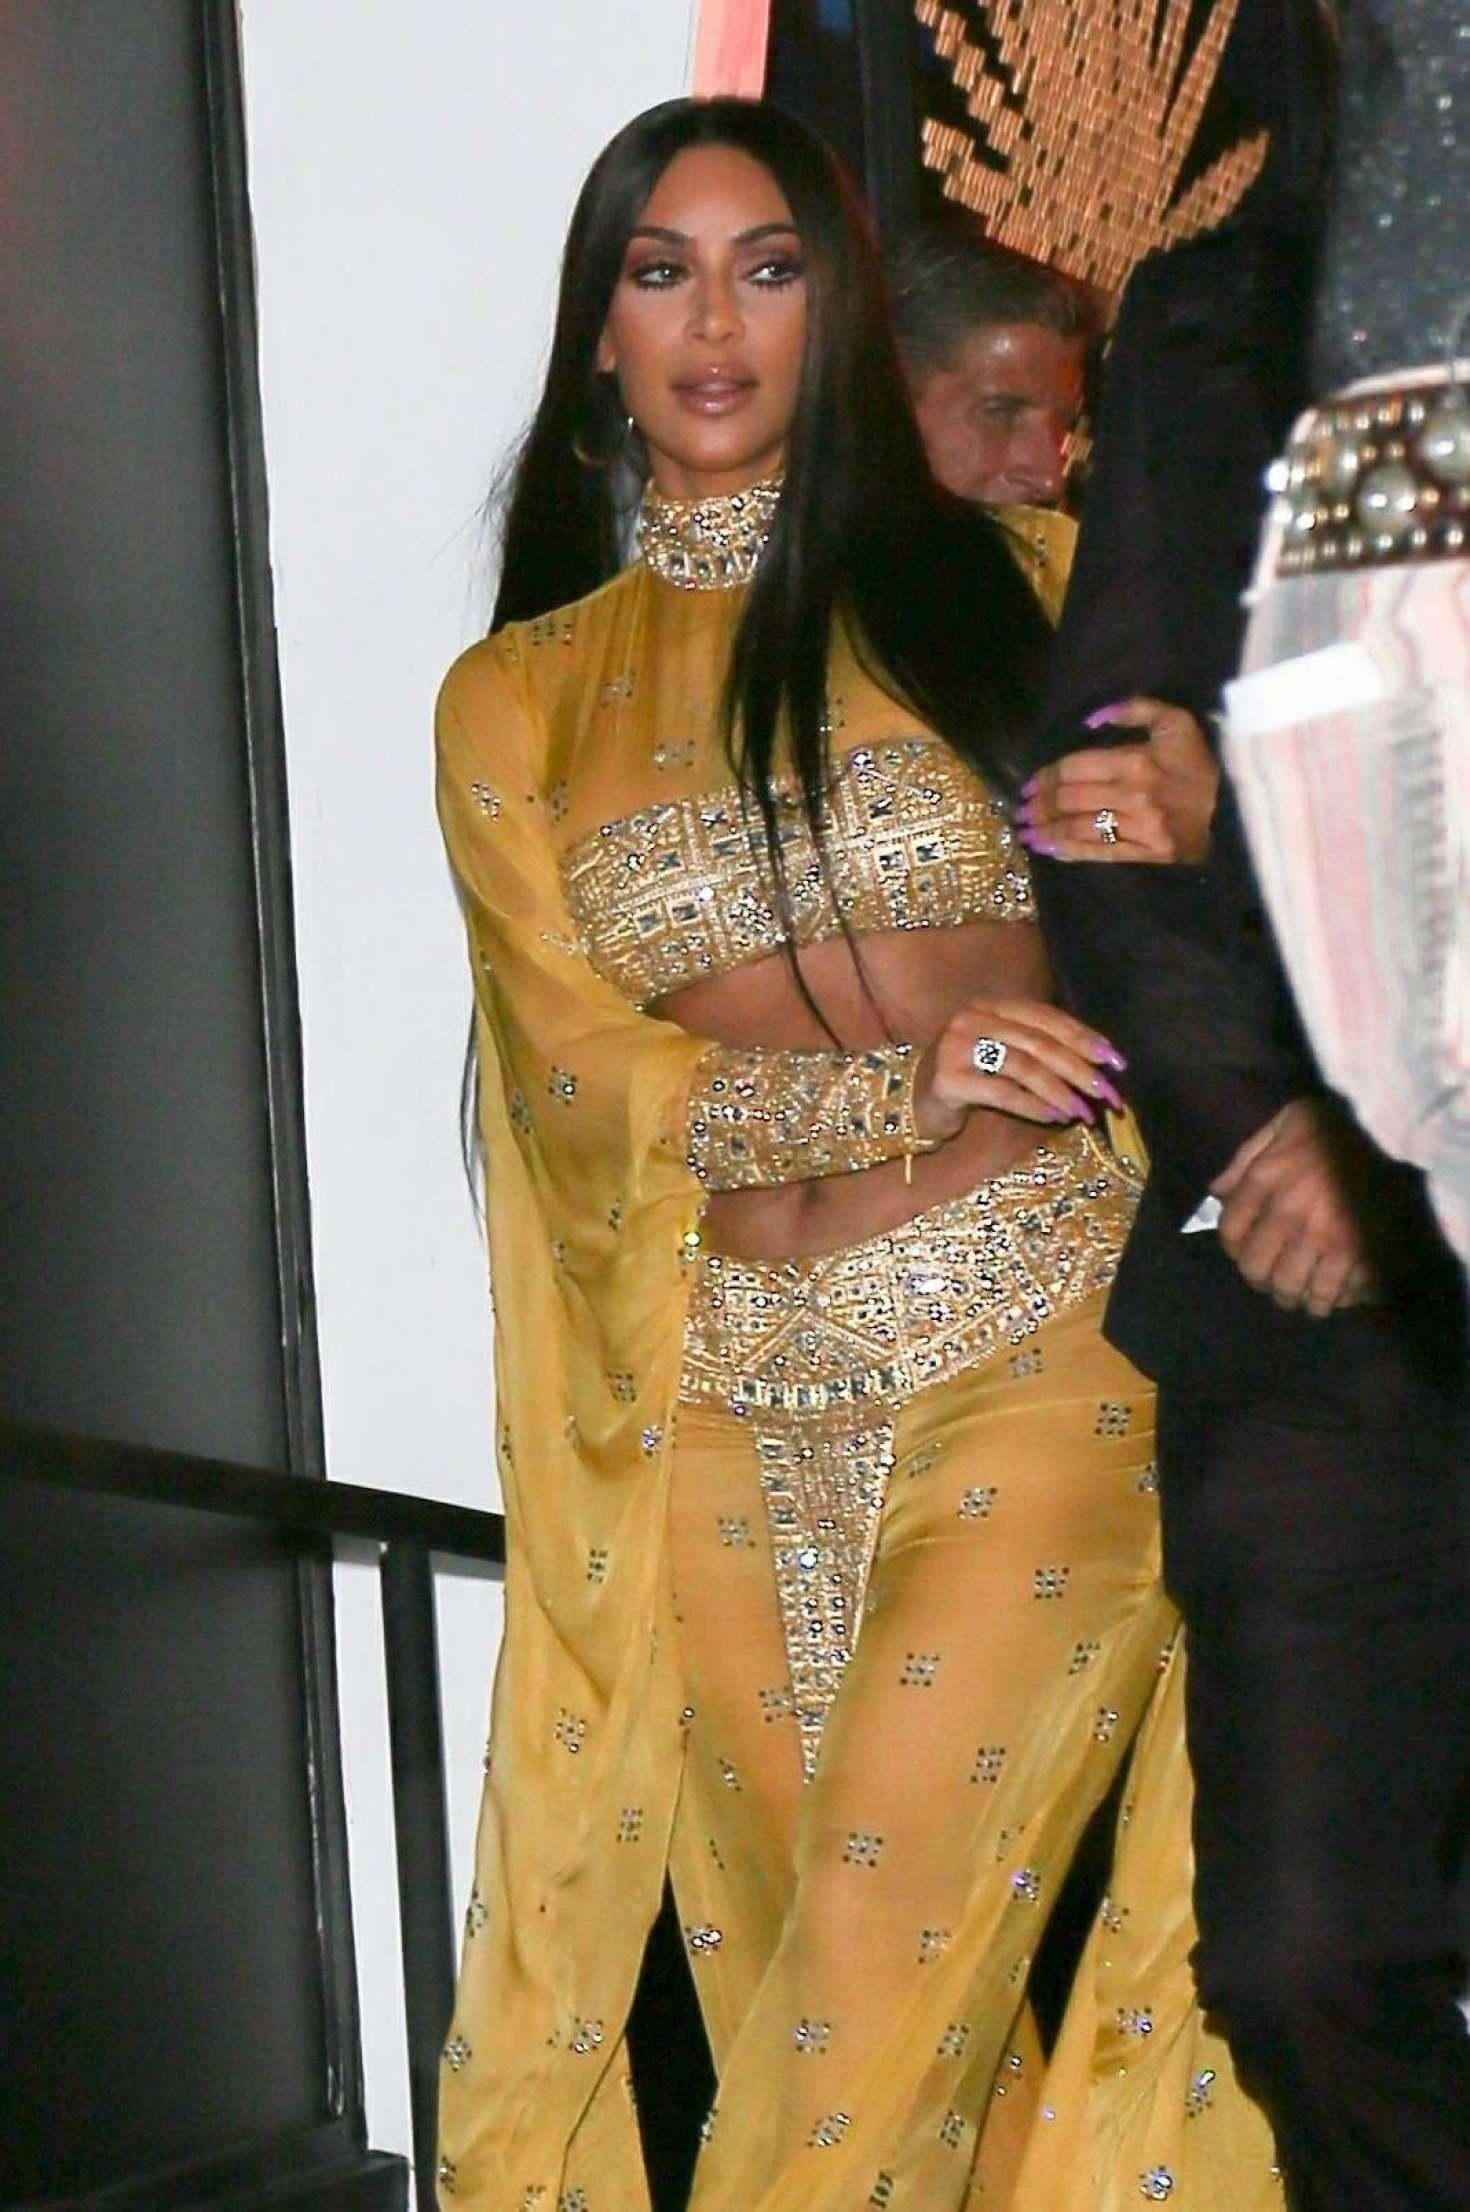 Kim Kardashian - 2017 Tequila Casamigos Annual Halloween Bash in LA